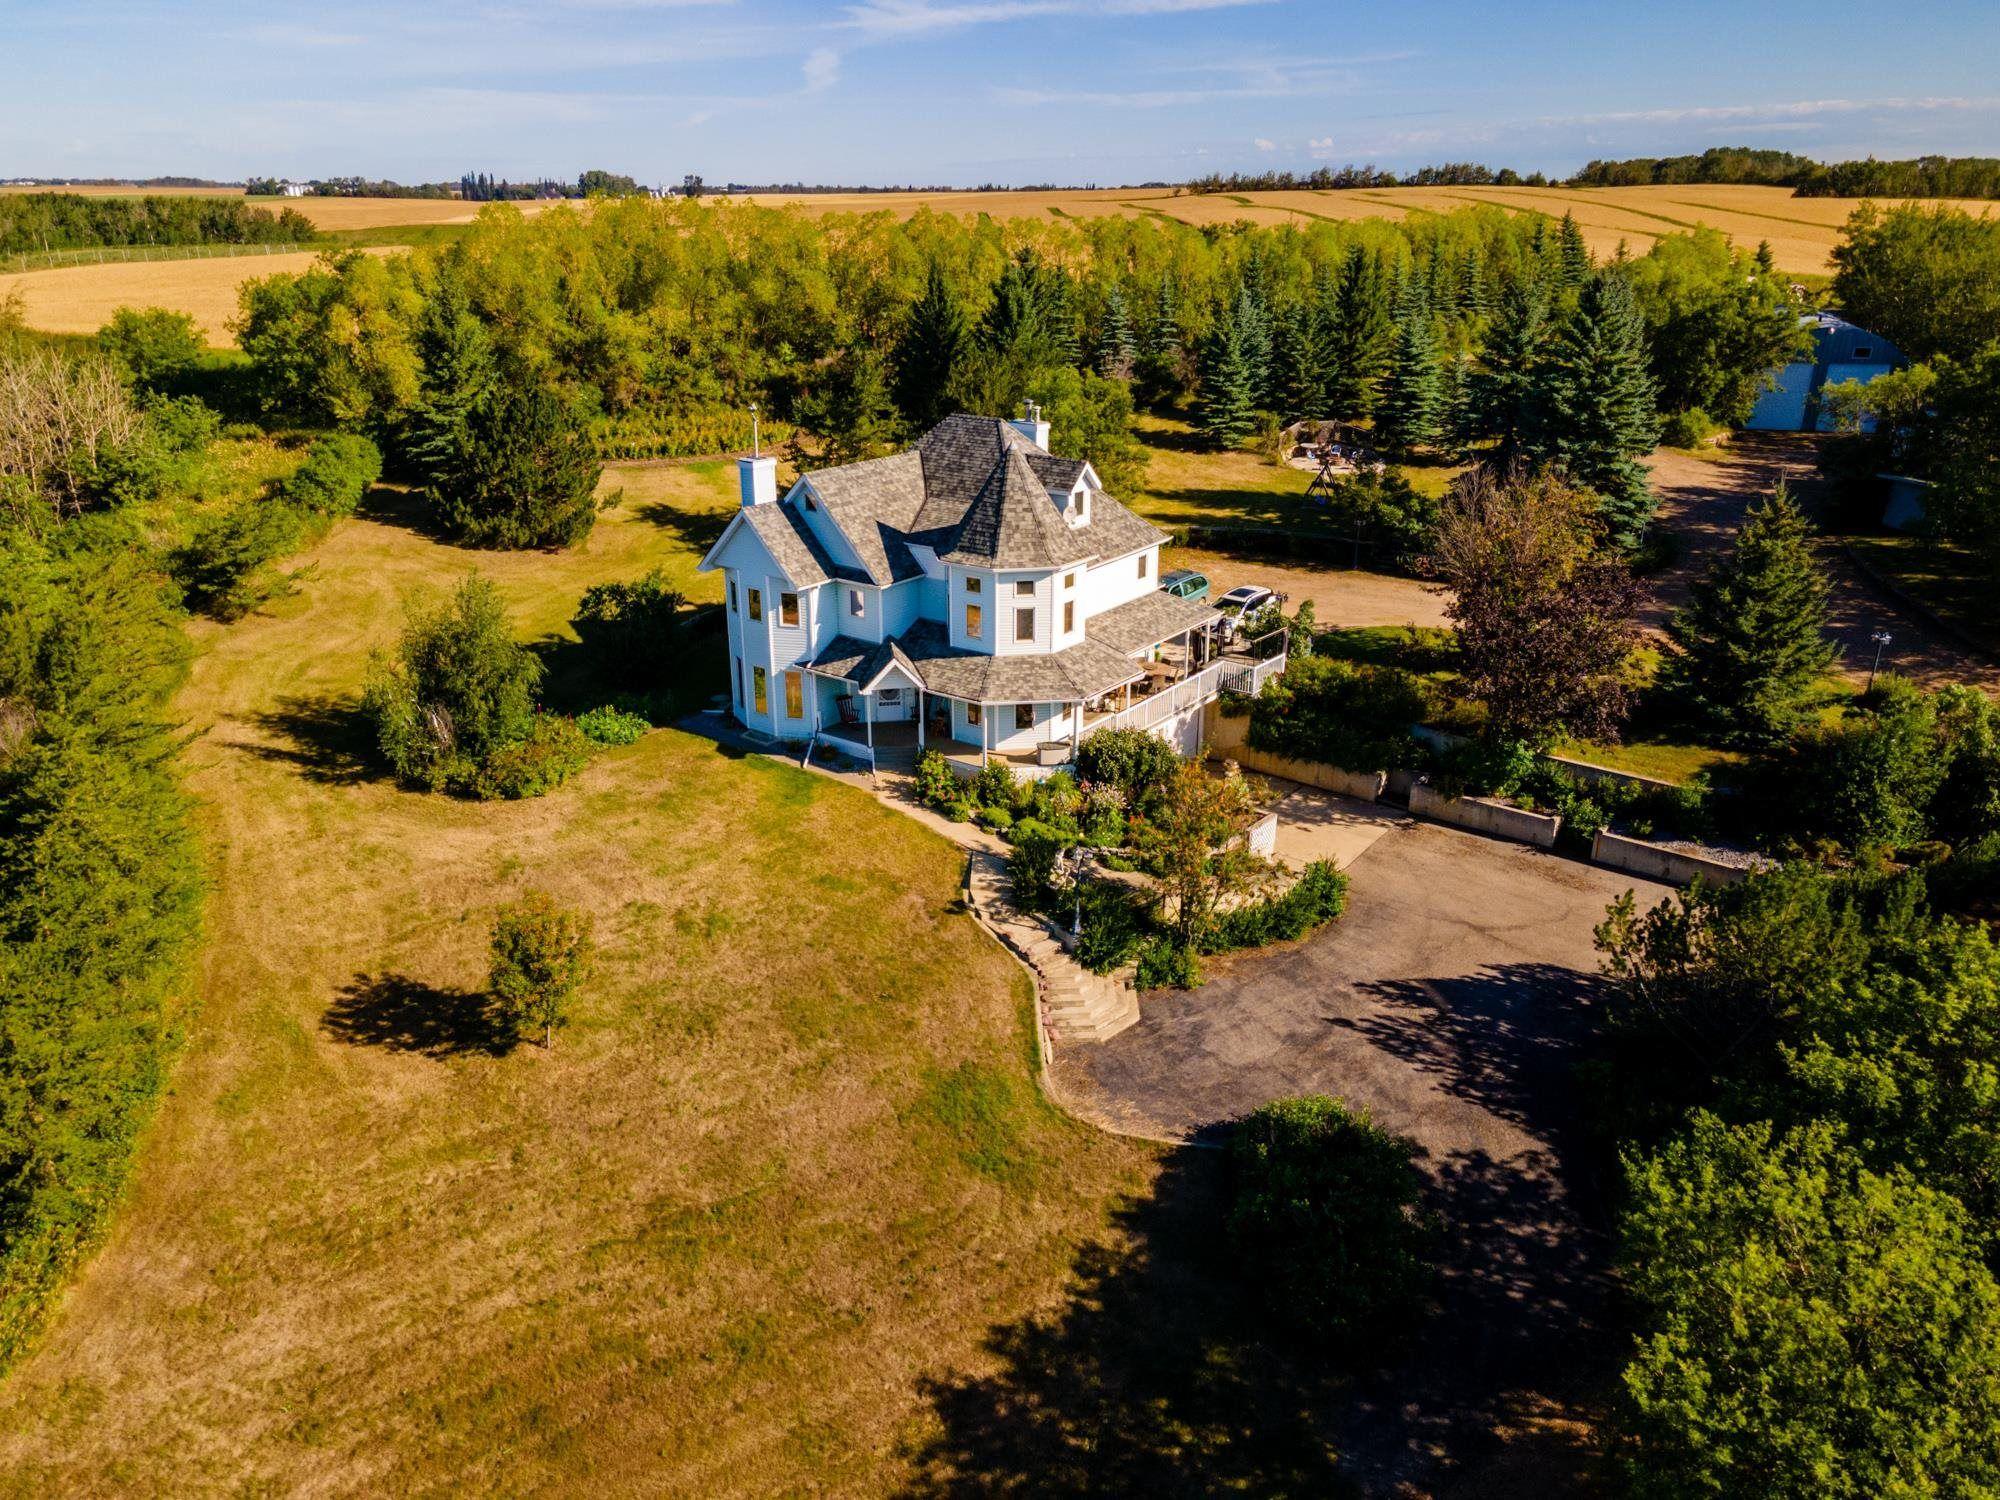 Main Photo: 24124 TWP RD 554: Rural Sturgeon County House for sale : MLS®# E4260651